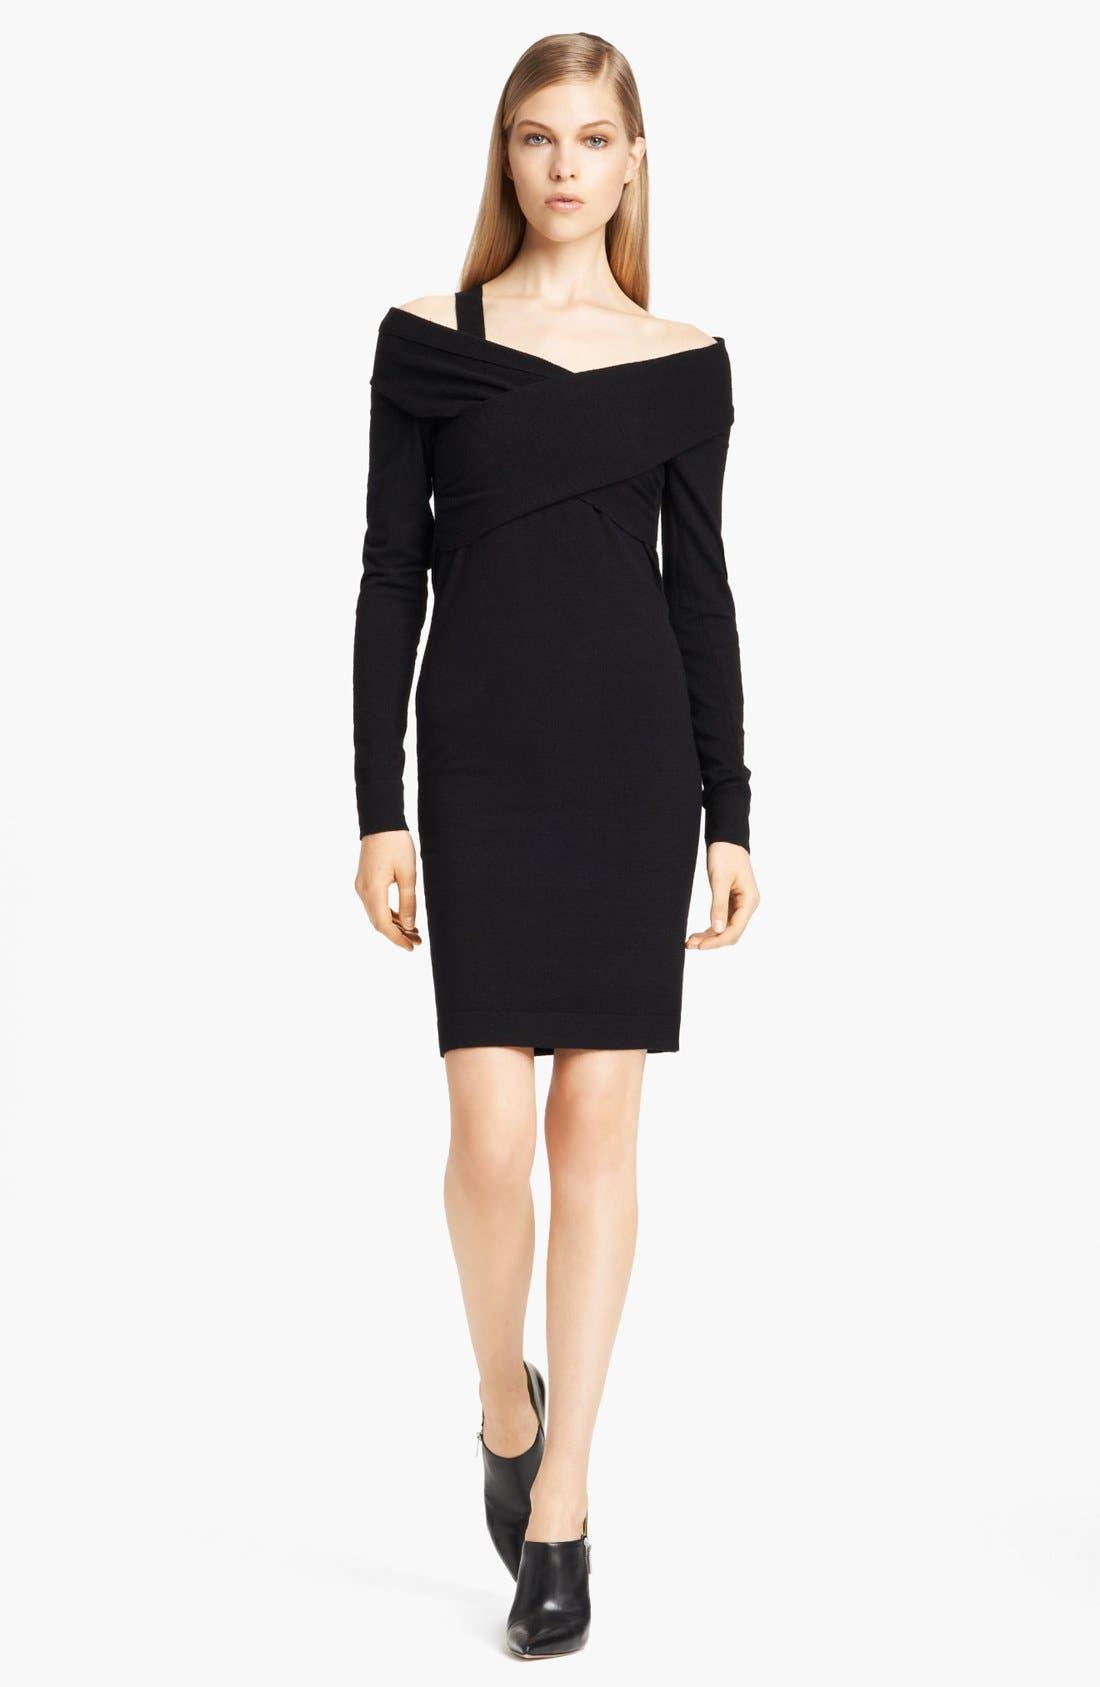 Main Image - Donna Karan Collection 'First Layer' Cashmere Blend Dress